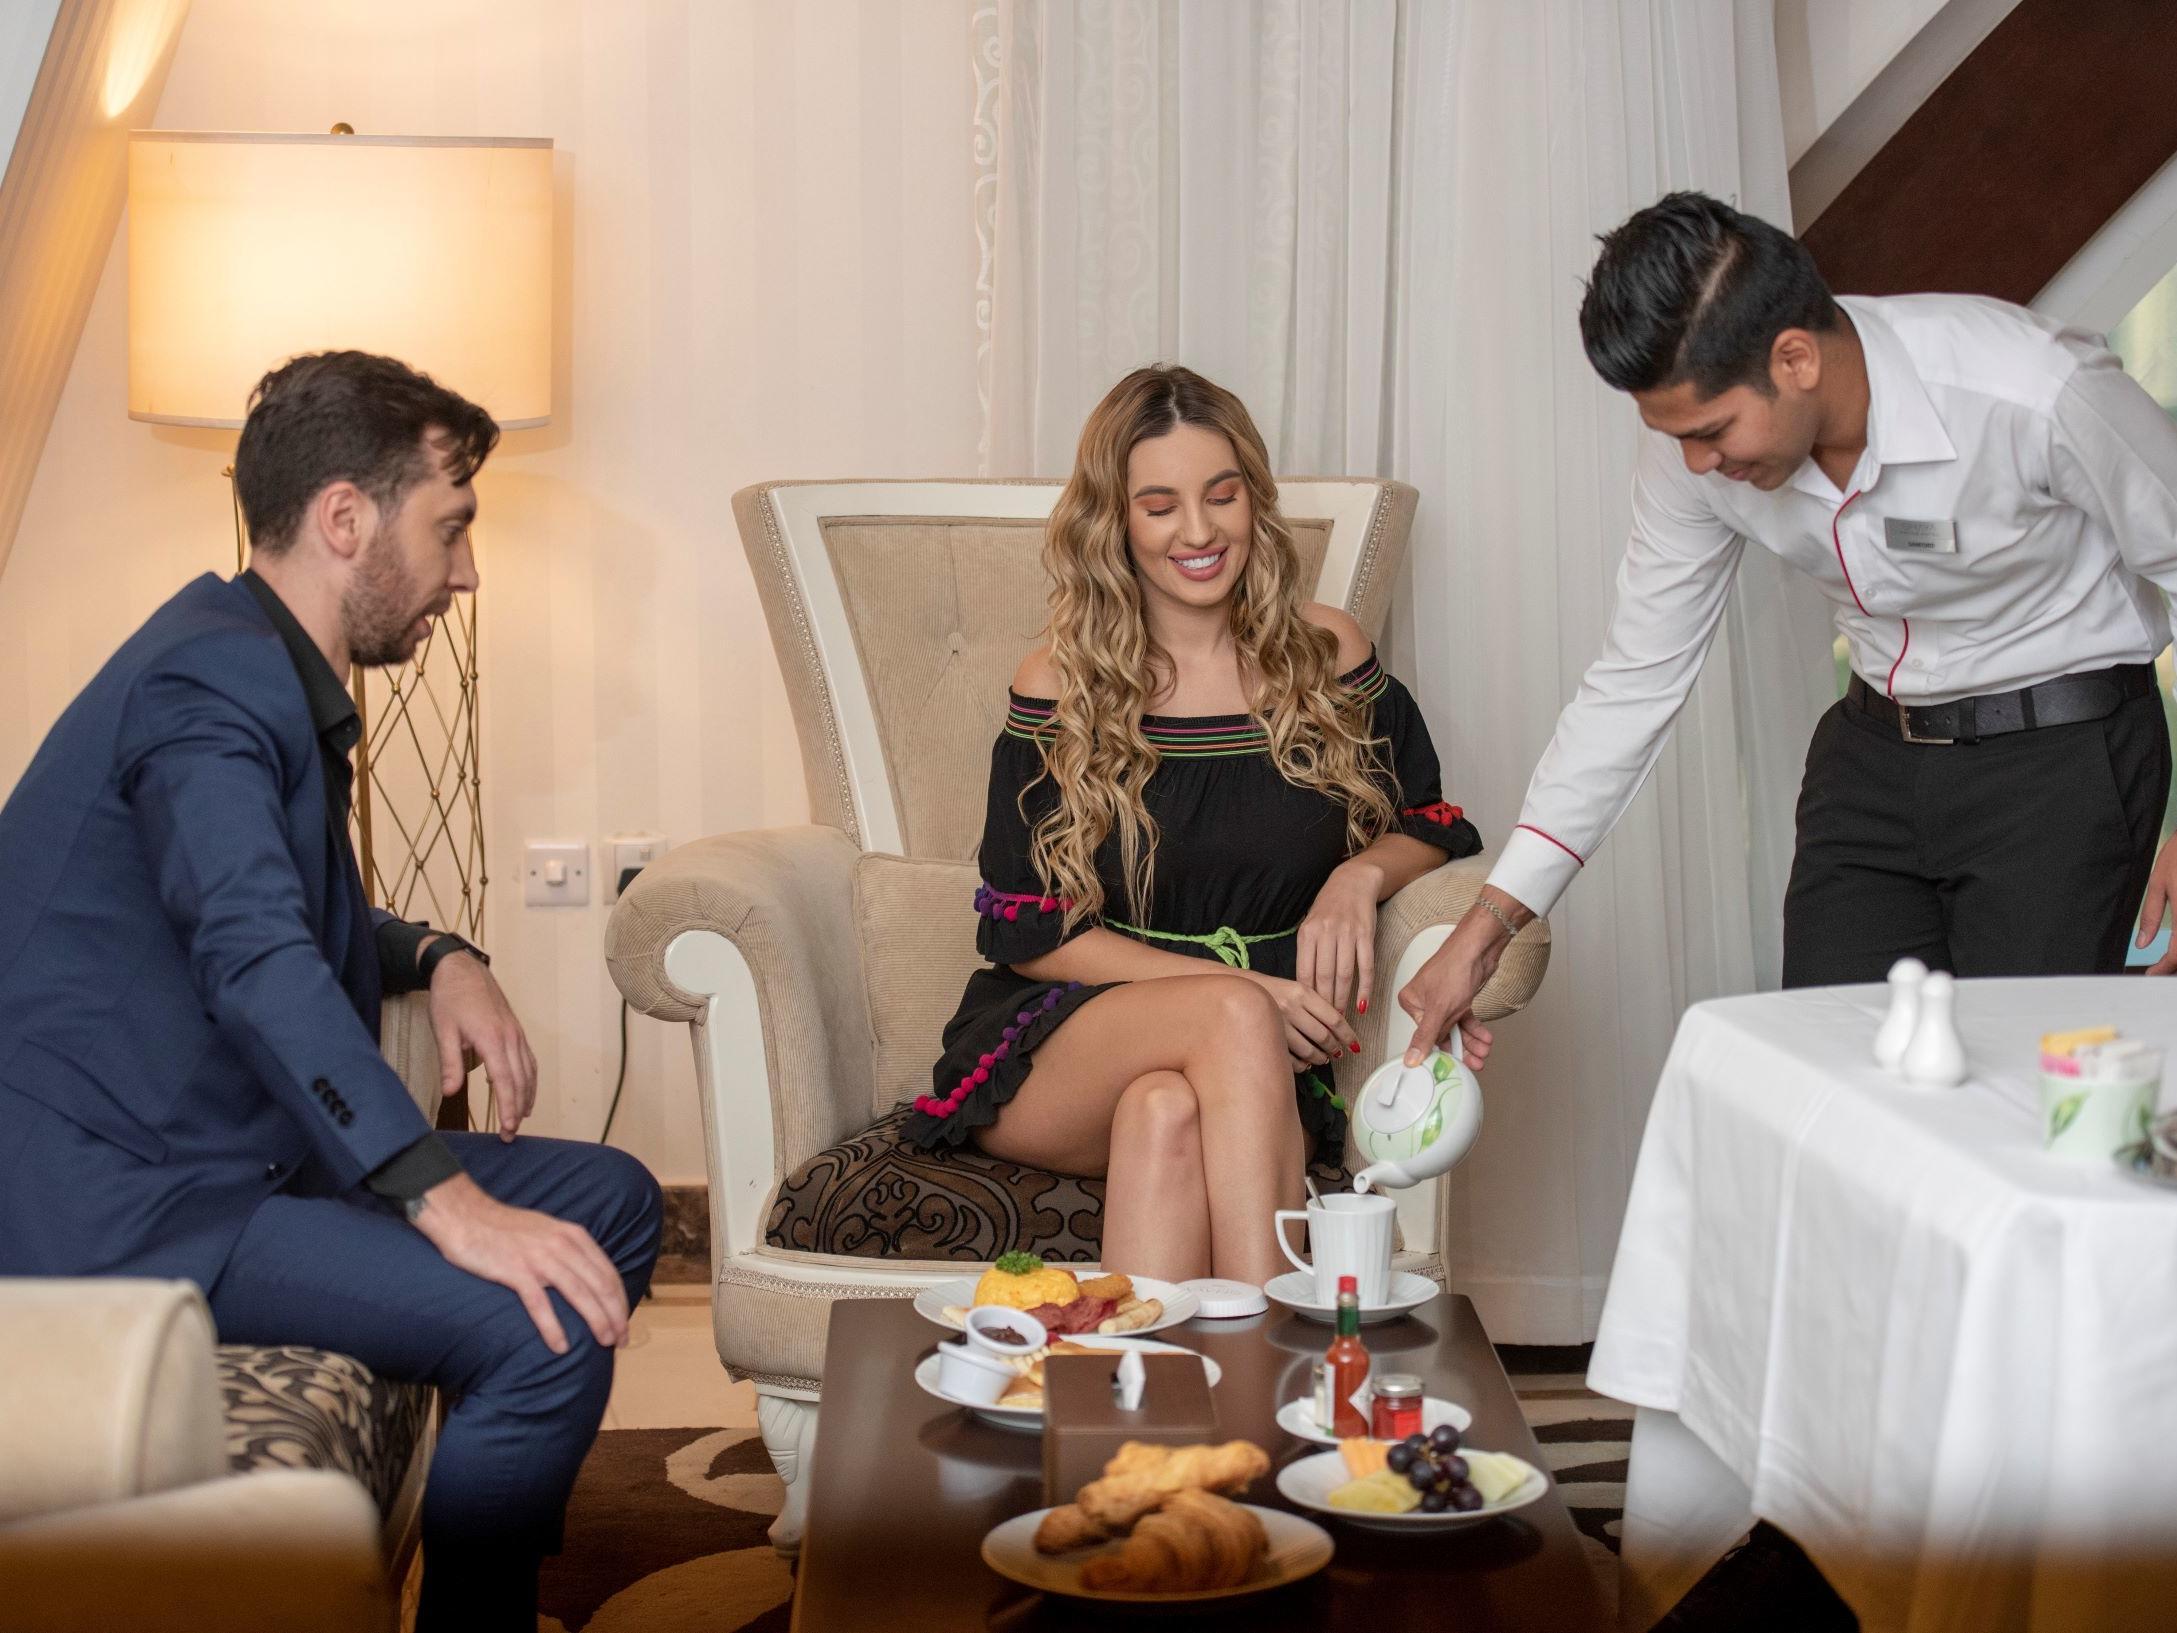 Ghaya Grand Hotel Dubai -Room Service Lifestyle Image 2